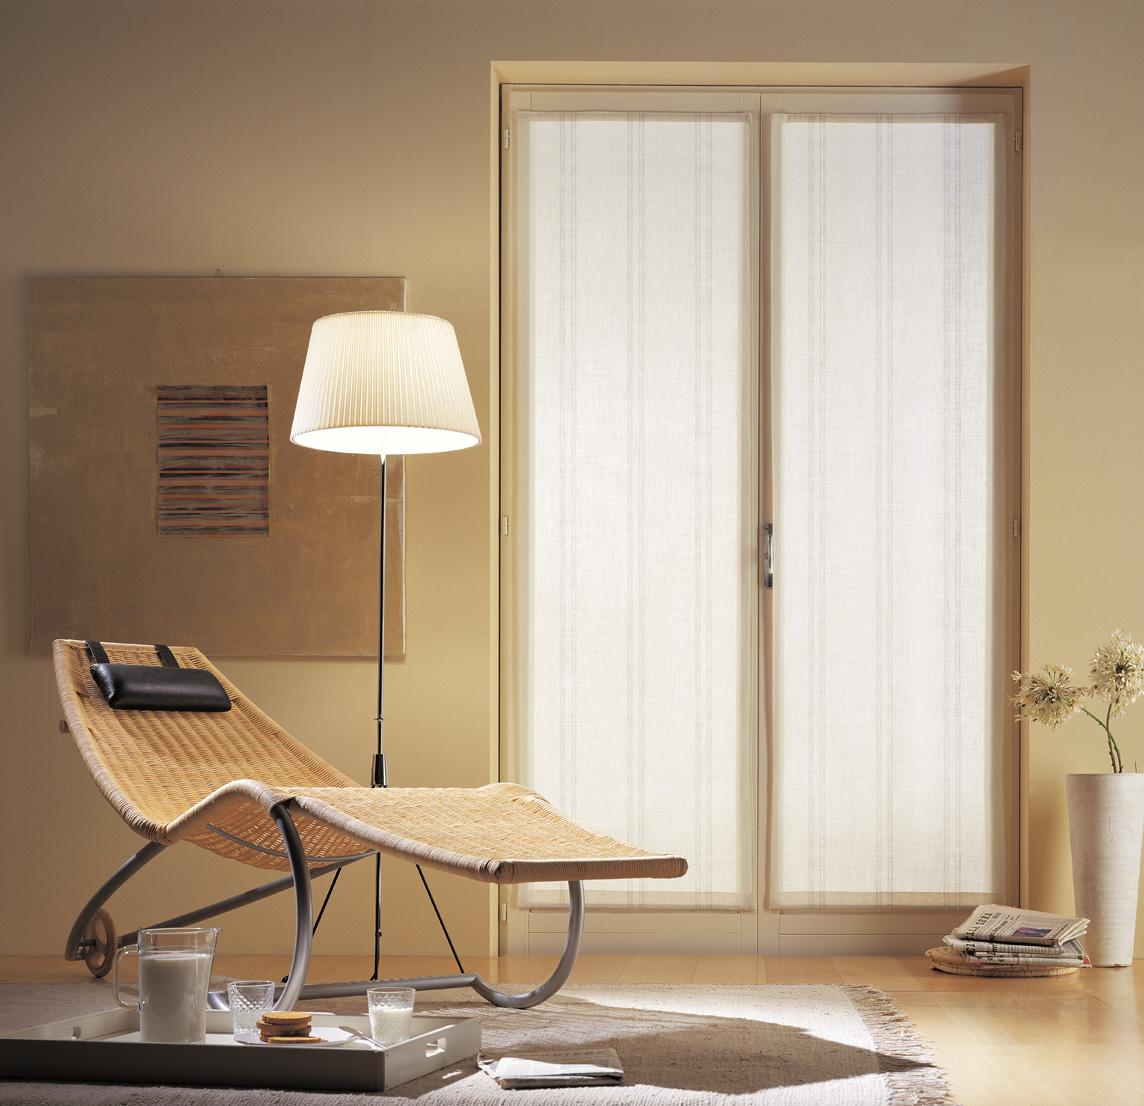 Tende a vetro massalongo tende e tendaggi a verona e provincia - Tende da finestra a vetro ...